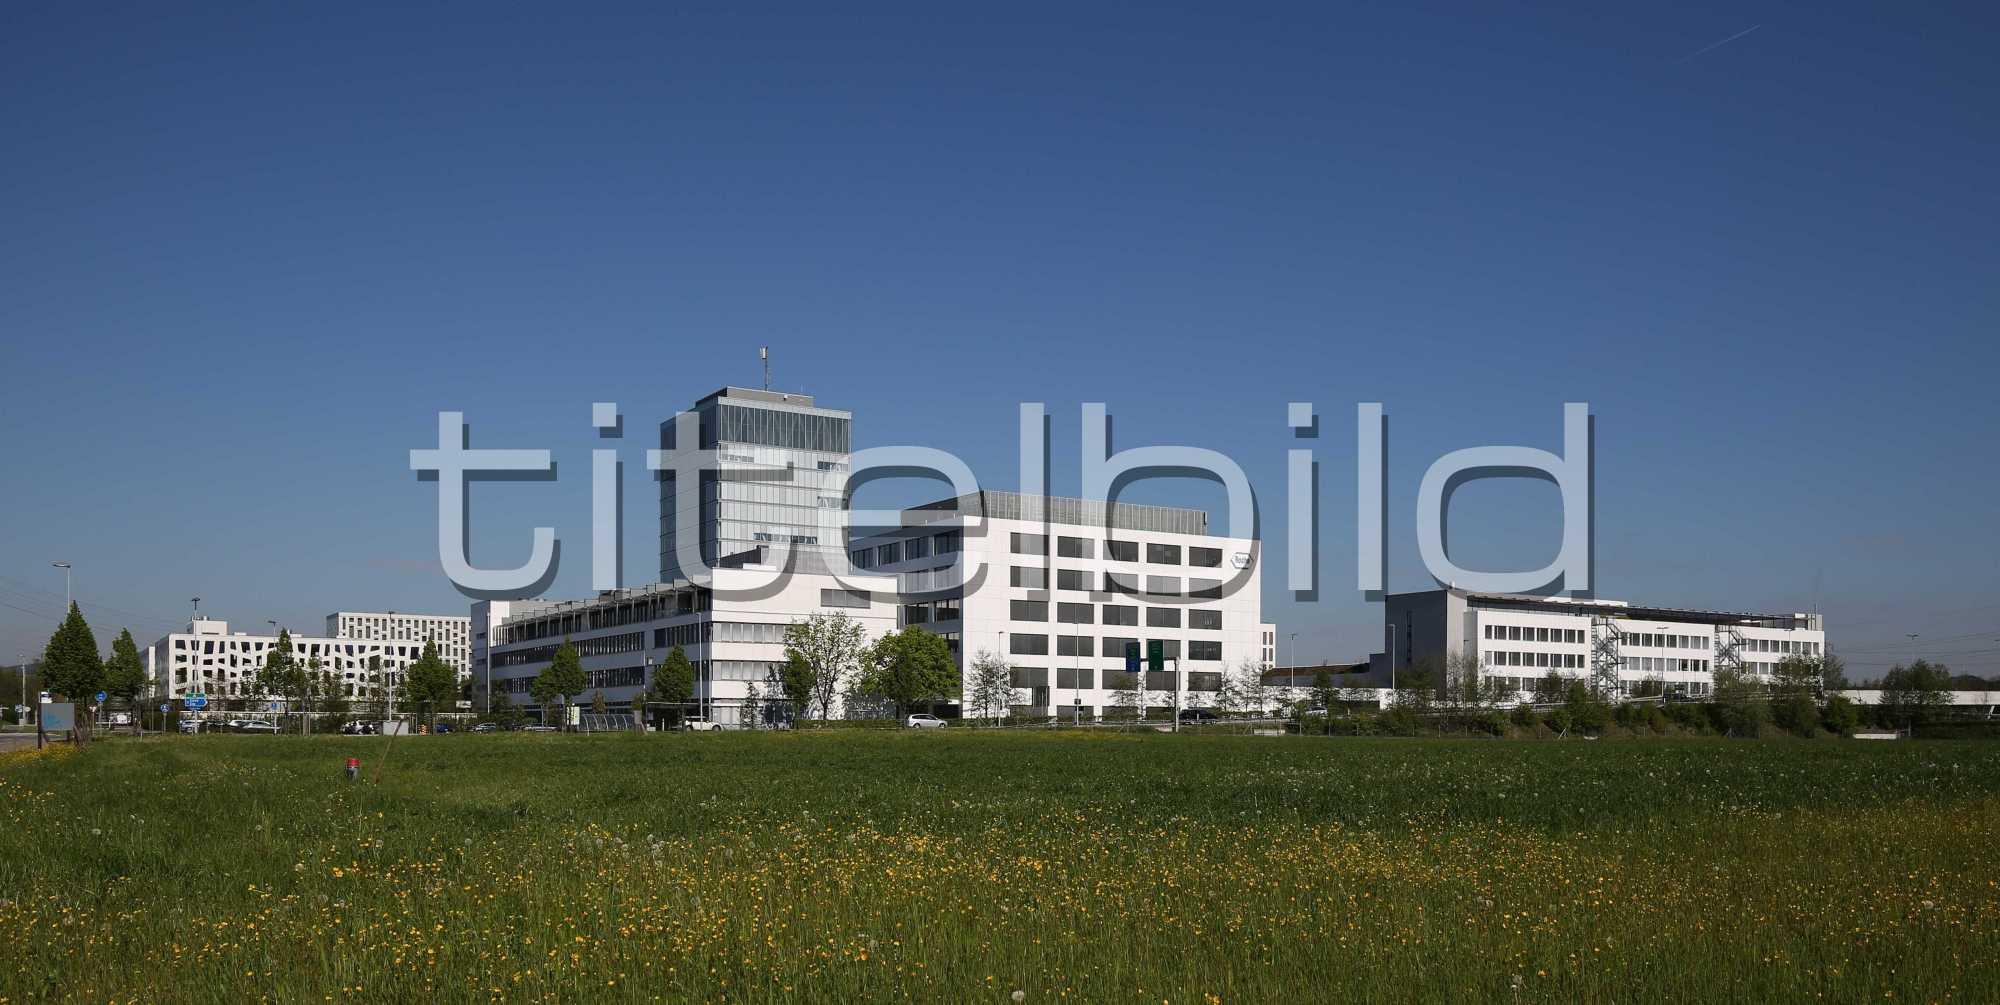 Projektbild-Nr. 3: Neubau Roche Rotkreuz Bau 7